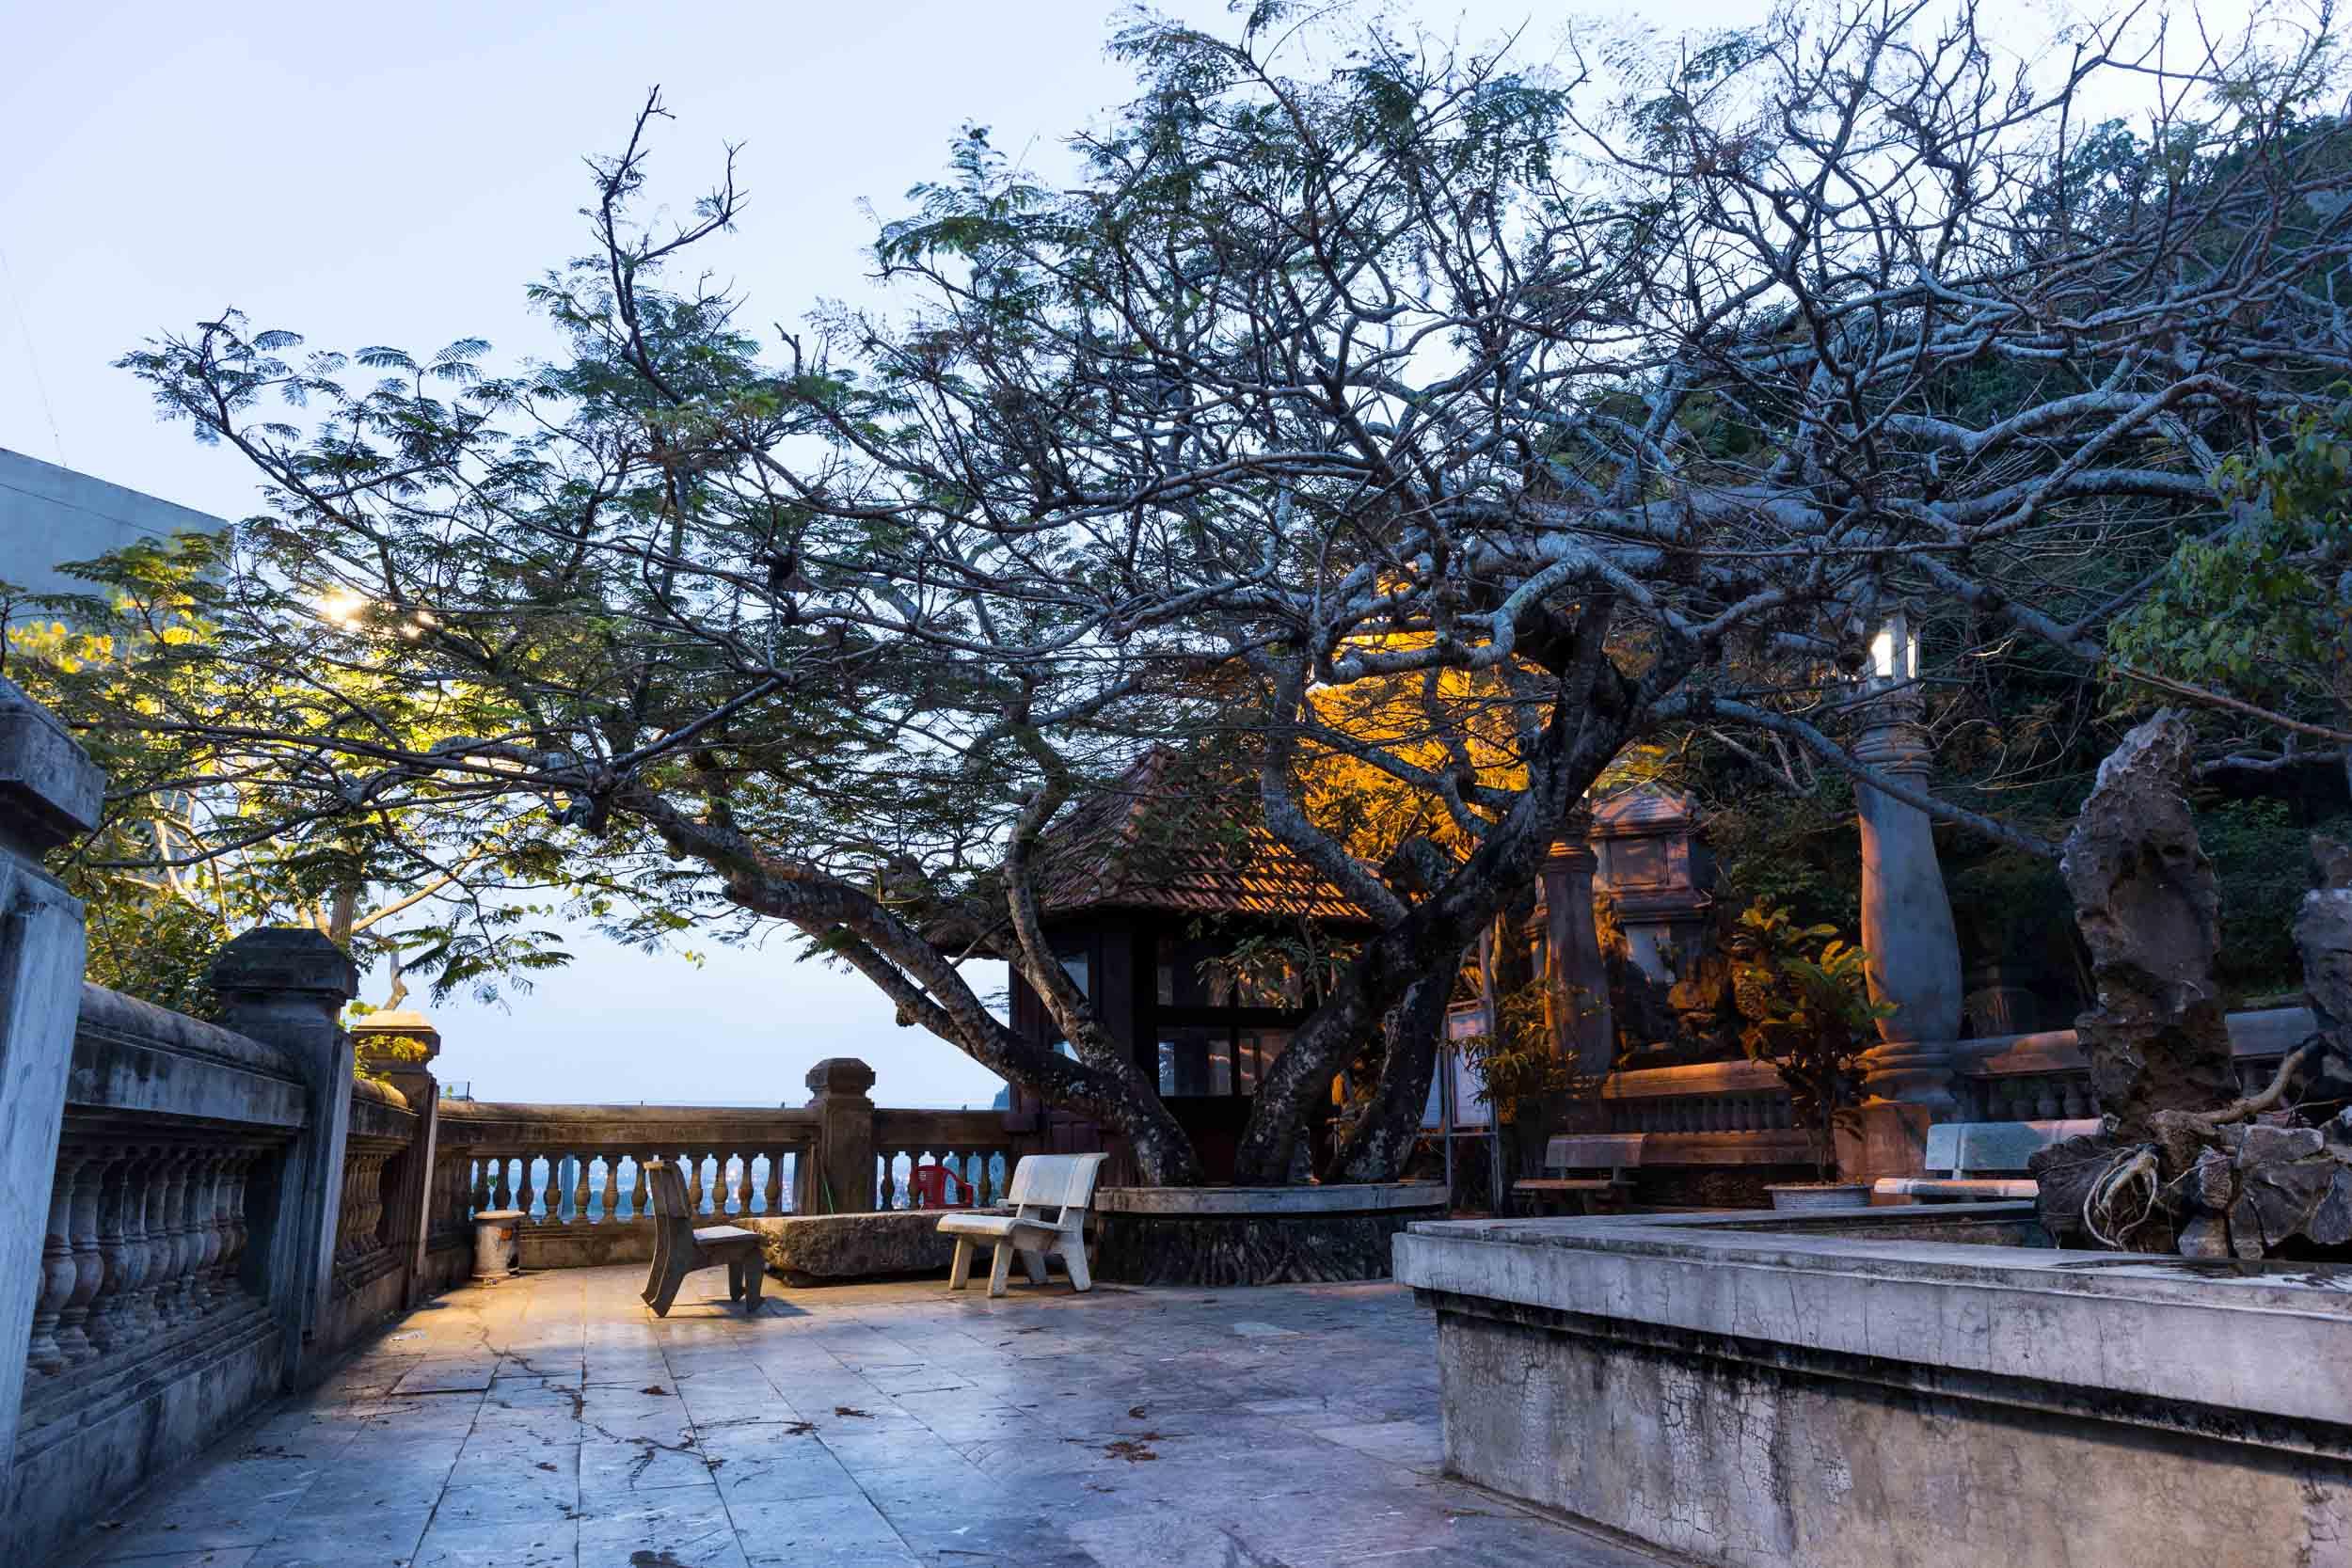 Temple courtyard, Marble Mountain, Da Nang, Vietnam.